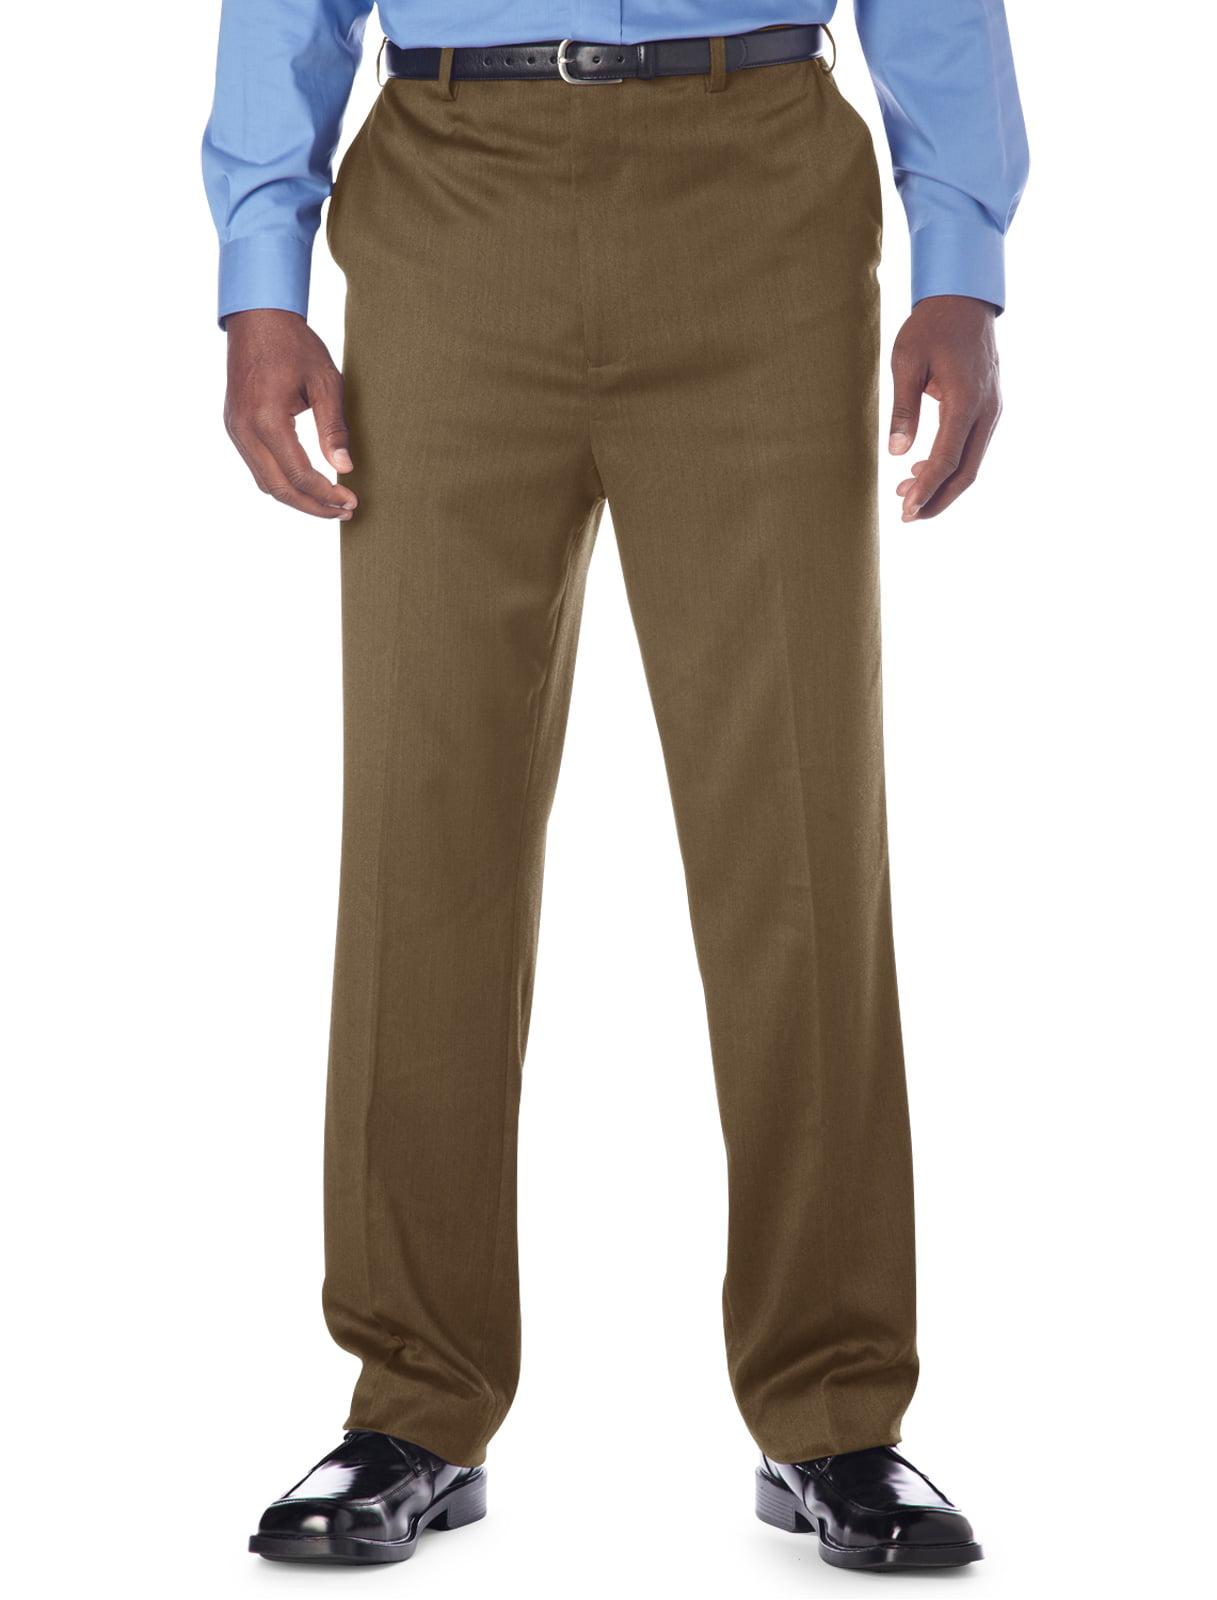 Men's Big & Tall Gold Series Continuous Comfort Flat-Front Sateen Pants--Unhemmed